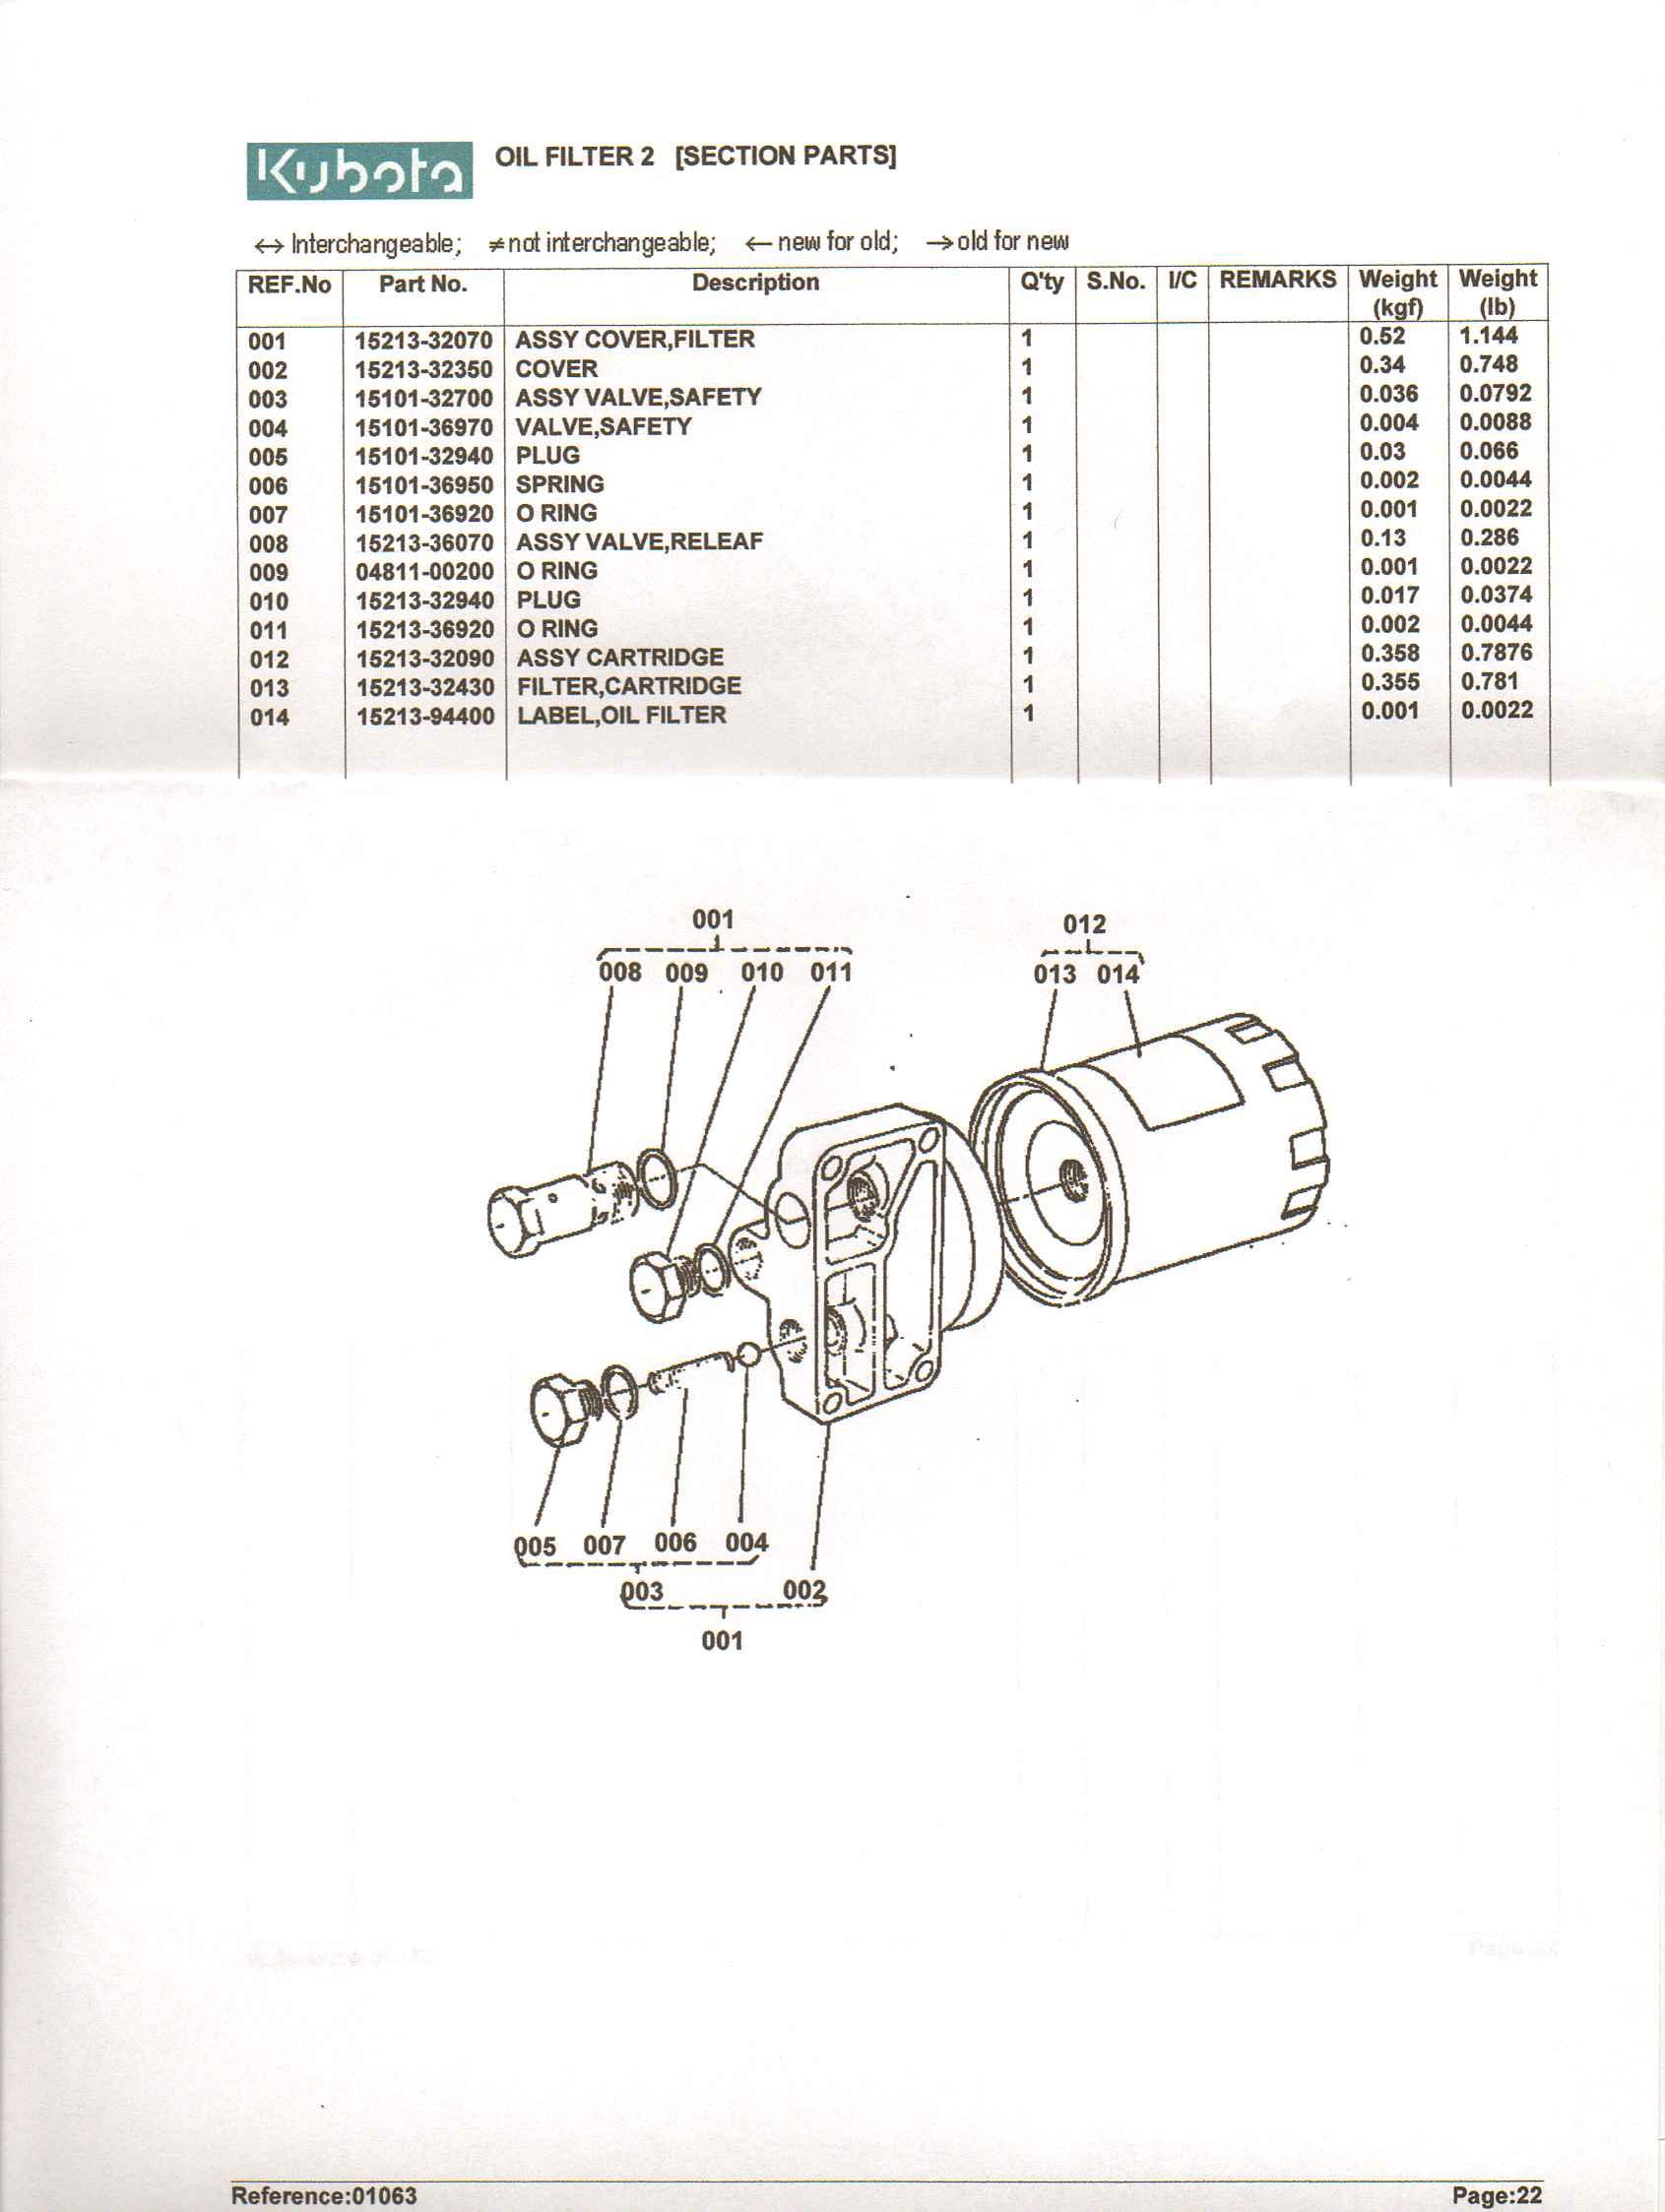 7 3 fuel filter head 7 3 fuel filter leak